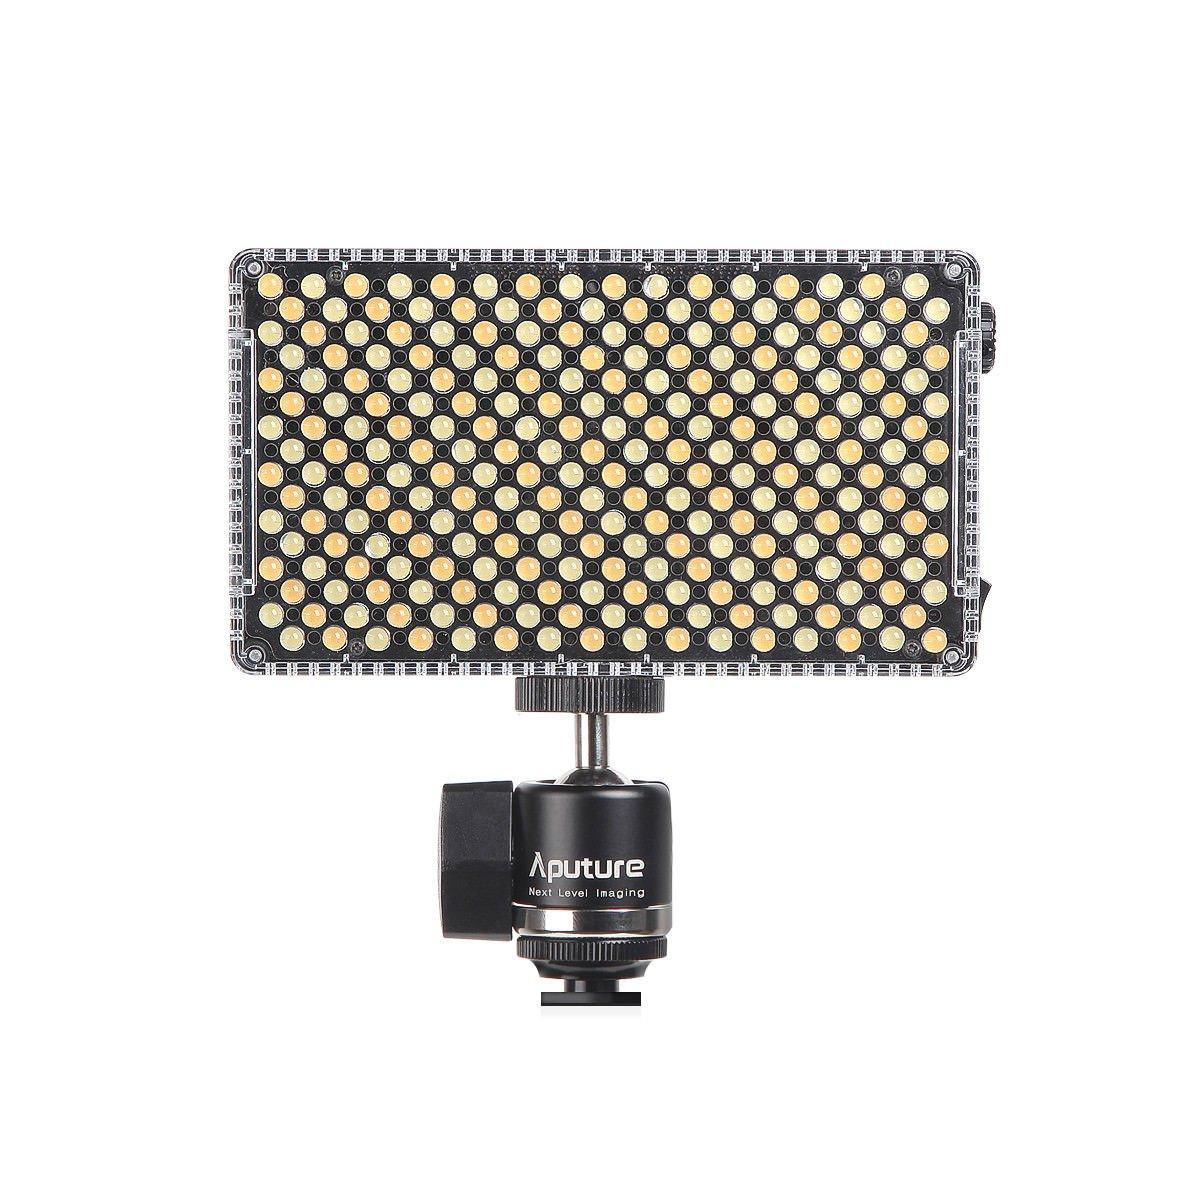 Aputure Amaran AL-F7 3200-9500K CRI/TLCI 95 LED panel LED video camera light (Aputure H198 Upgrade Version) Plus DigiKit Cleaning cloth